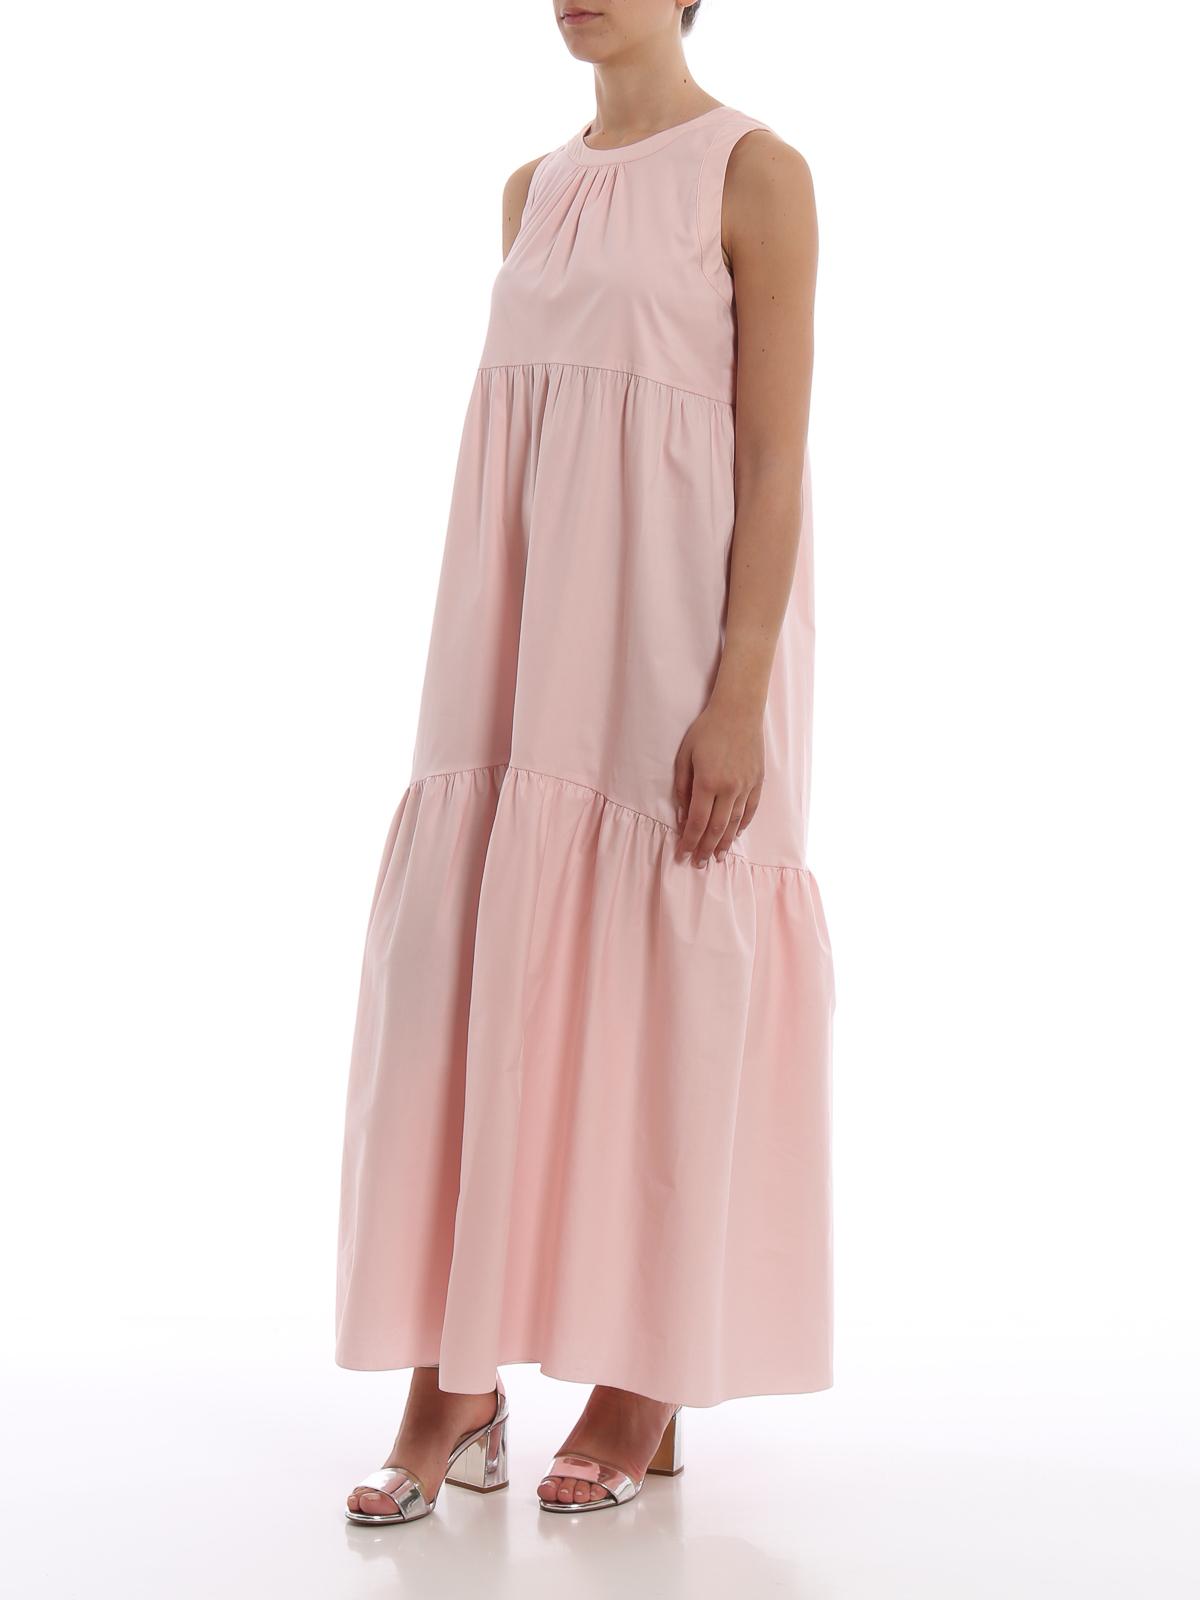 separation shoes 38af1 240e8 Blugirl - Abito maxi in cotone stretch rosa con balze ...